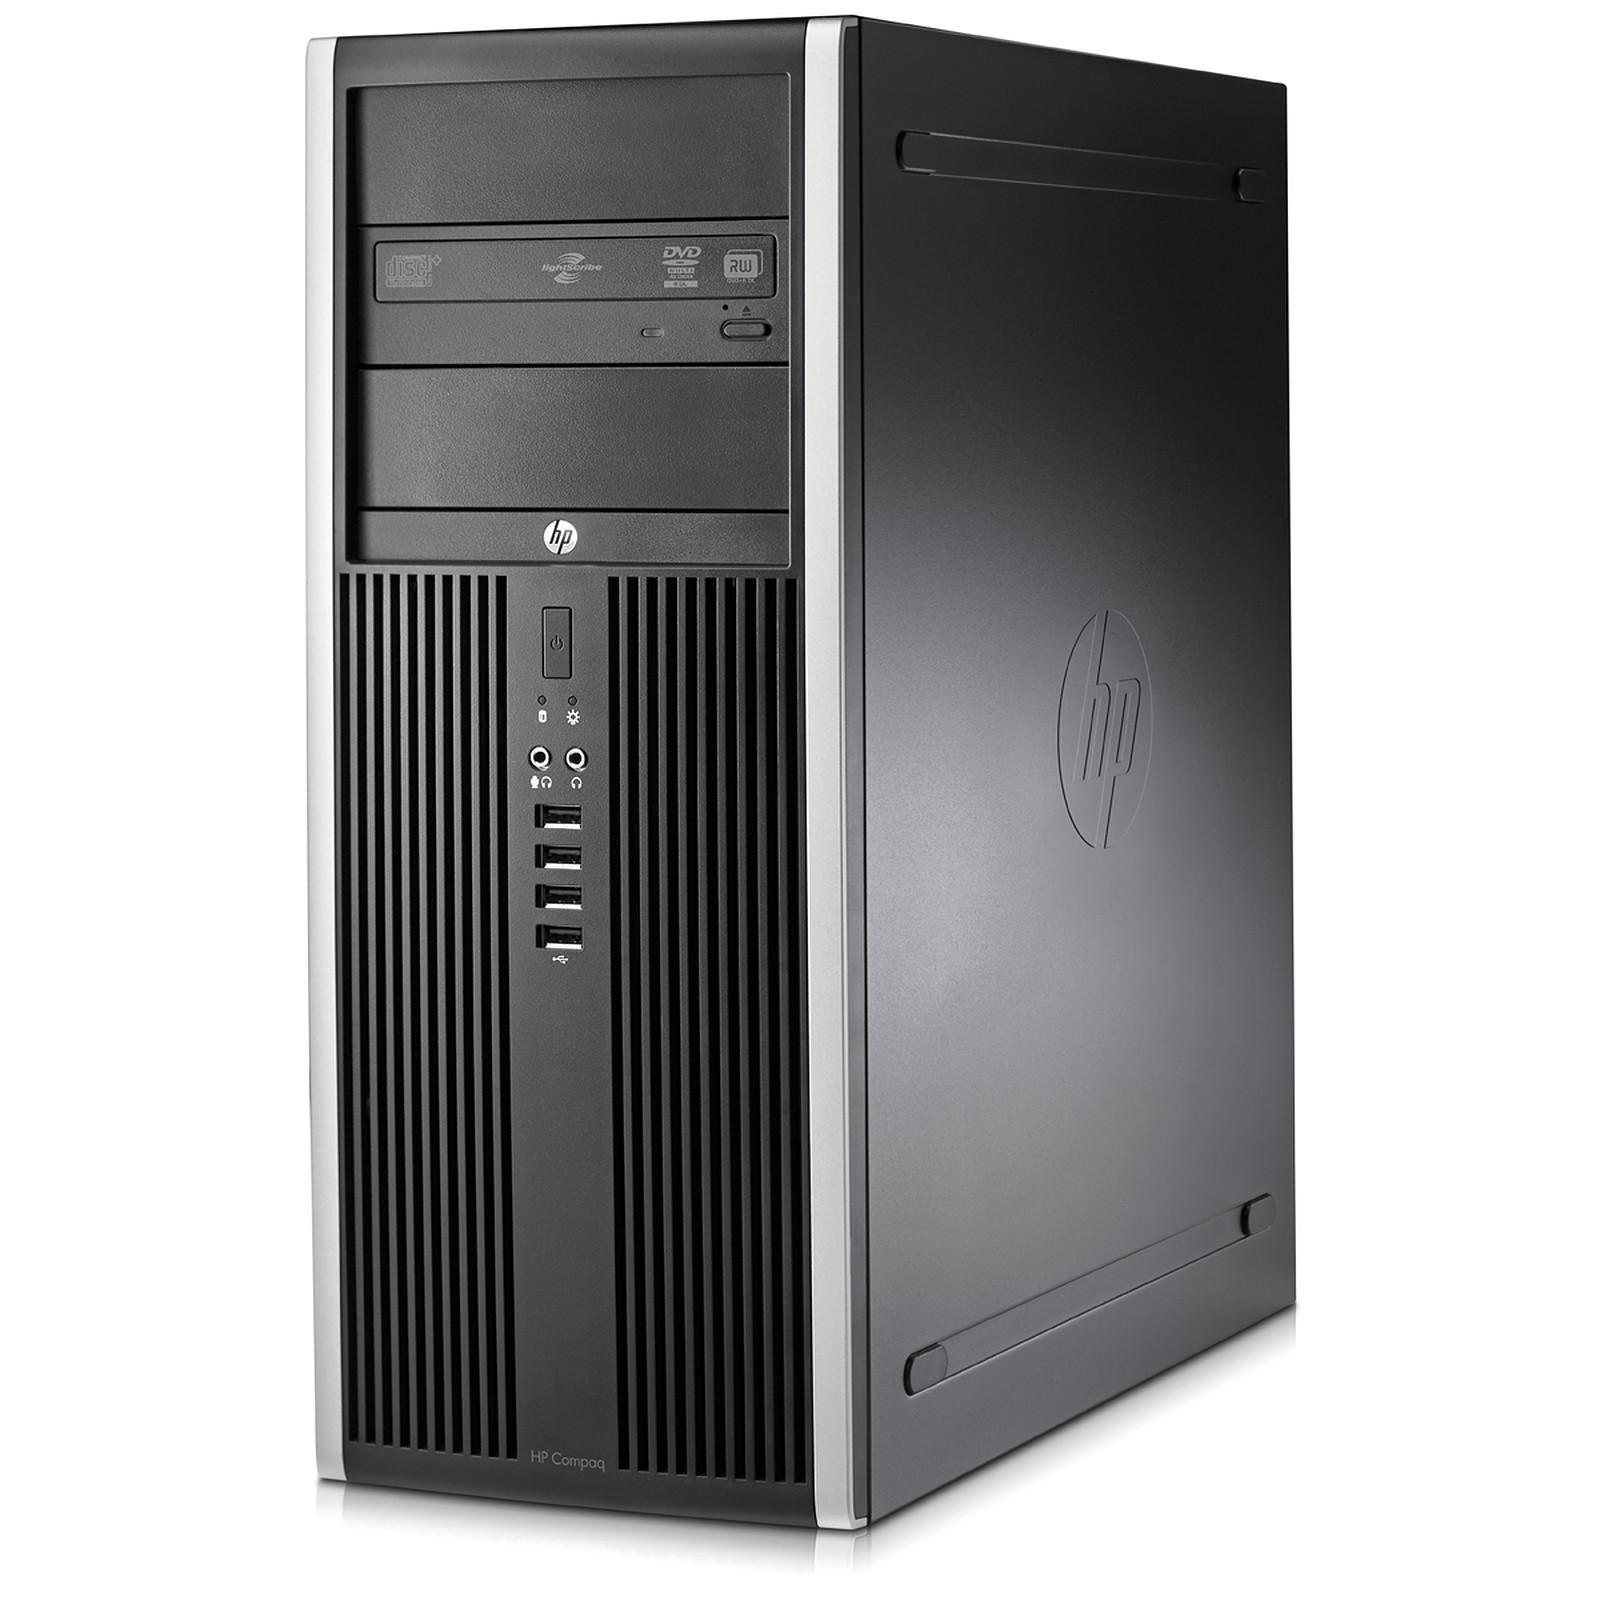 HP Compaq 8200 Elite MT Core i7 3,4 GHz - HDD 500 Go RAM 8 Go